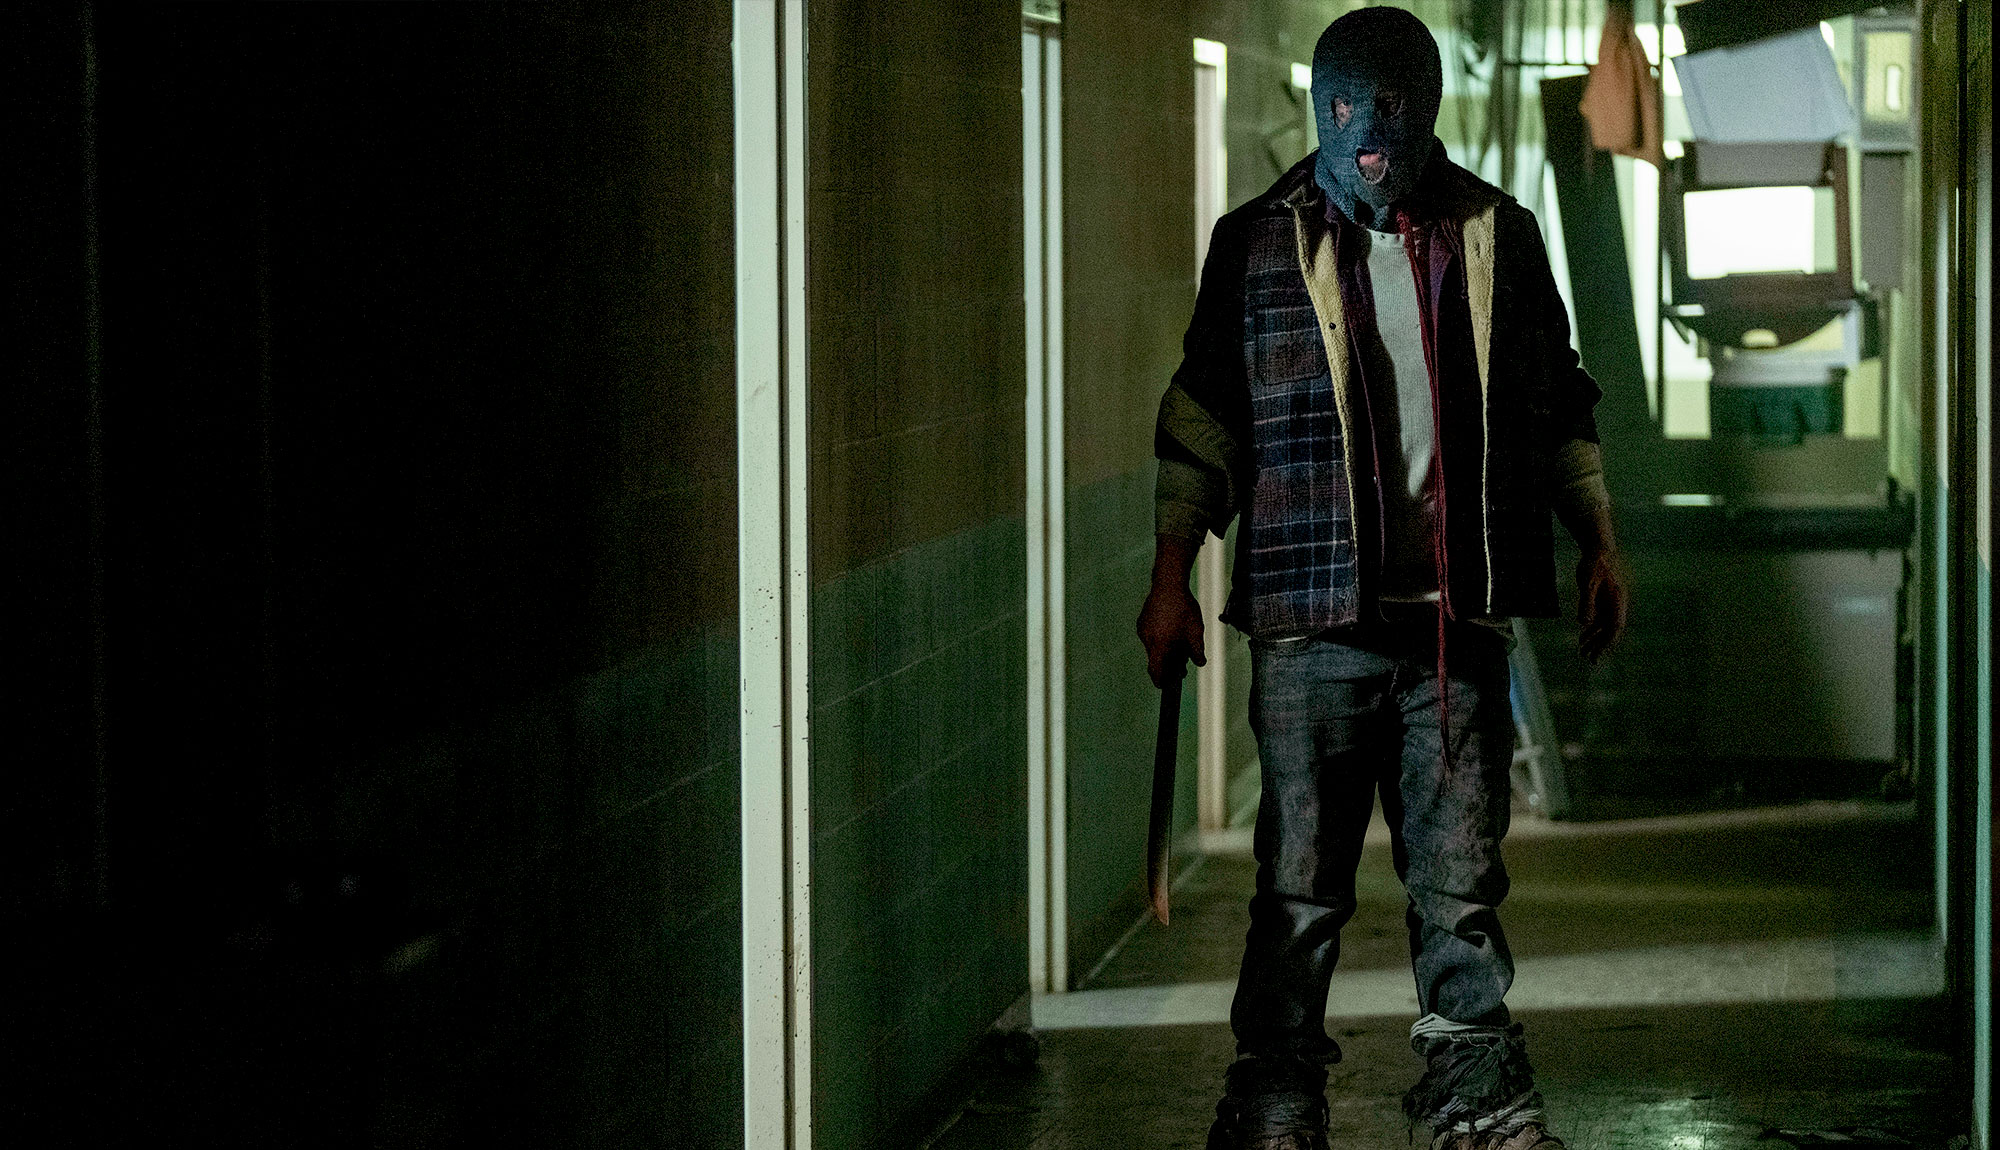 Beta Gets a Backstory In Walking Dead Episode 1002 Images